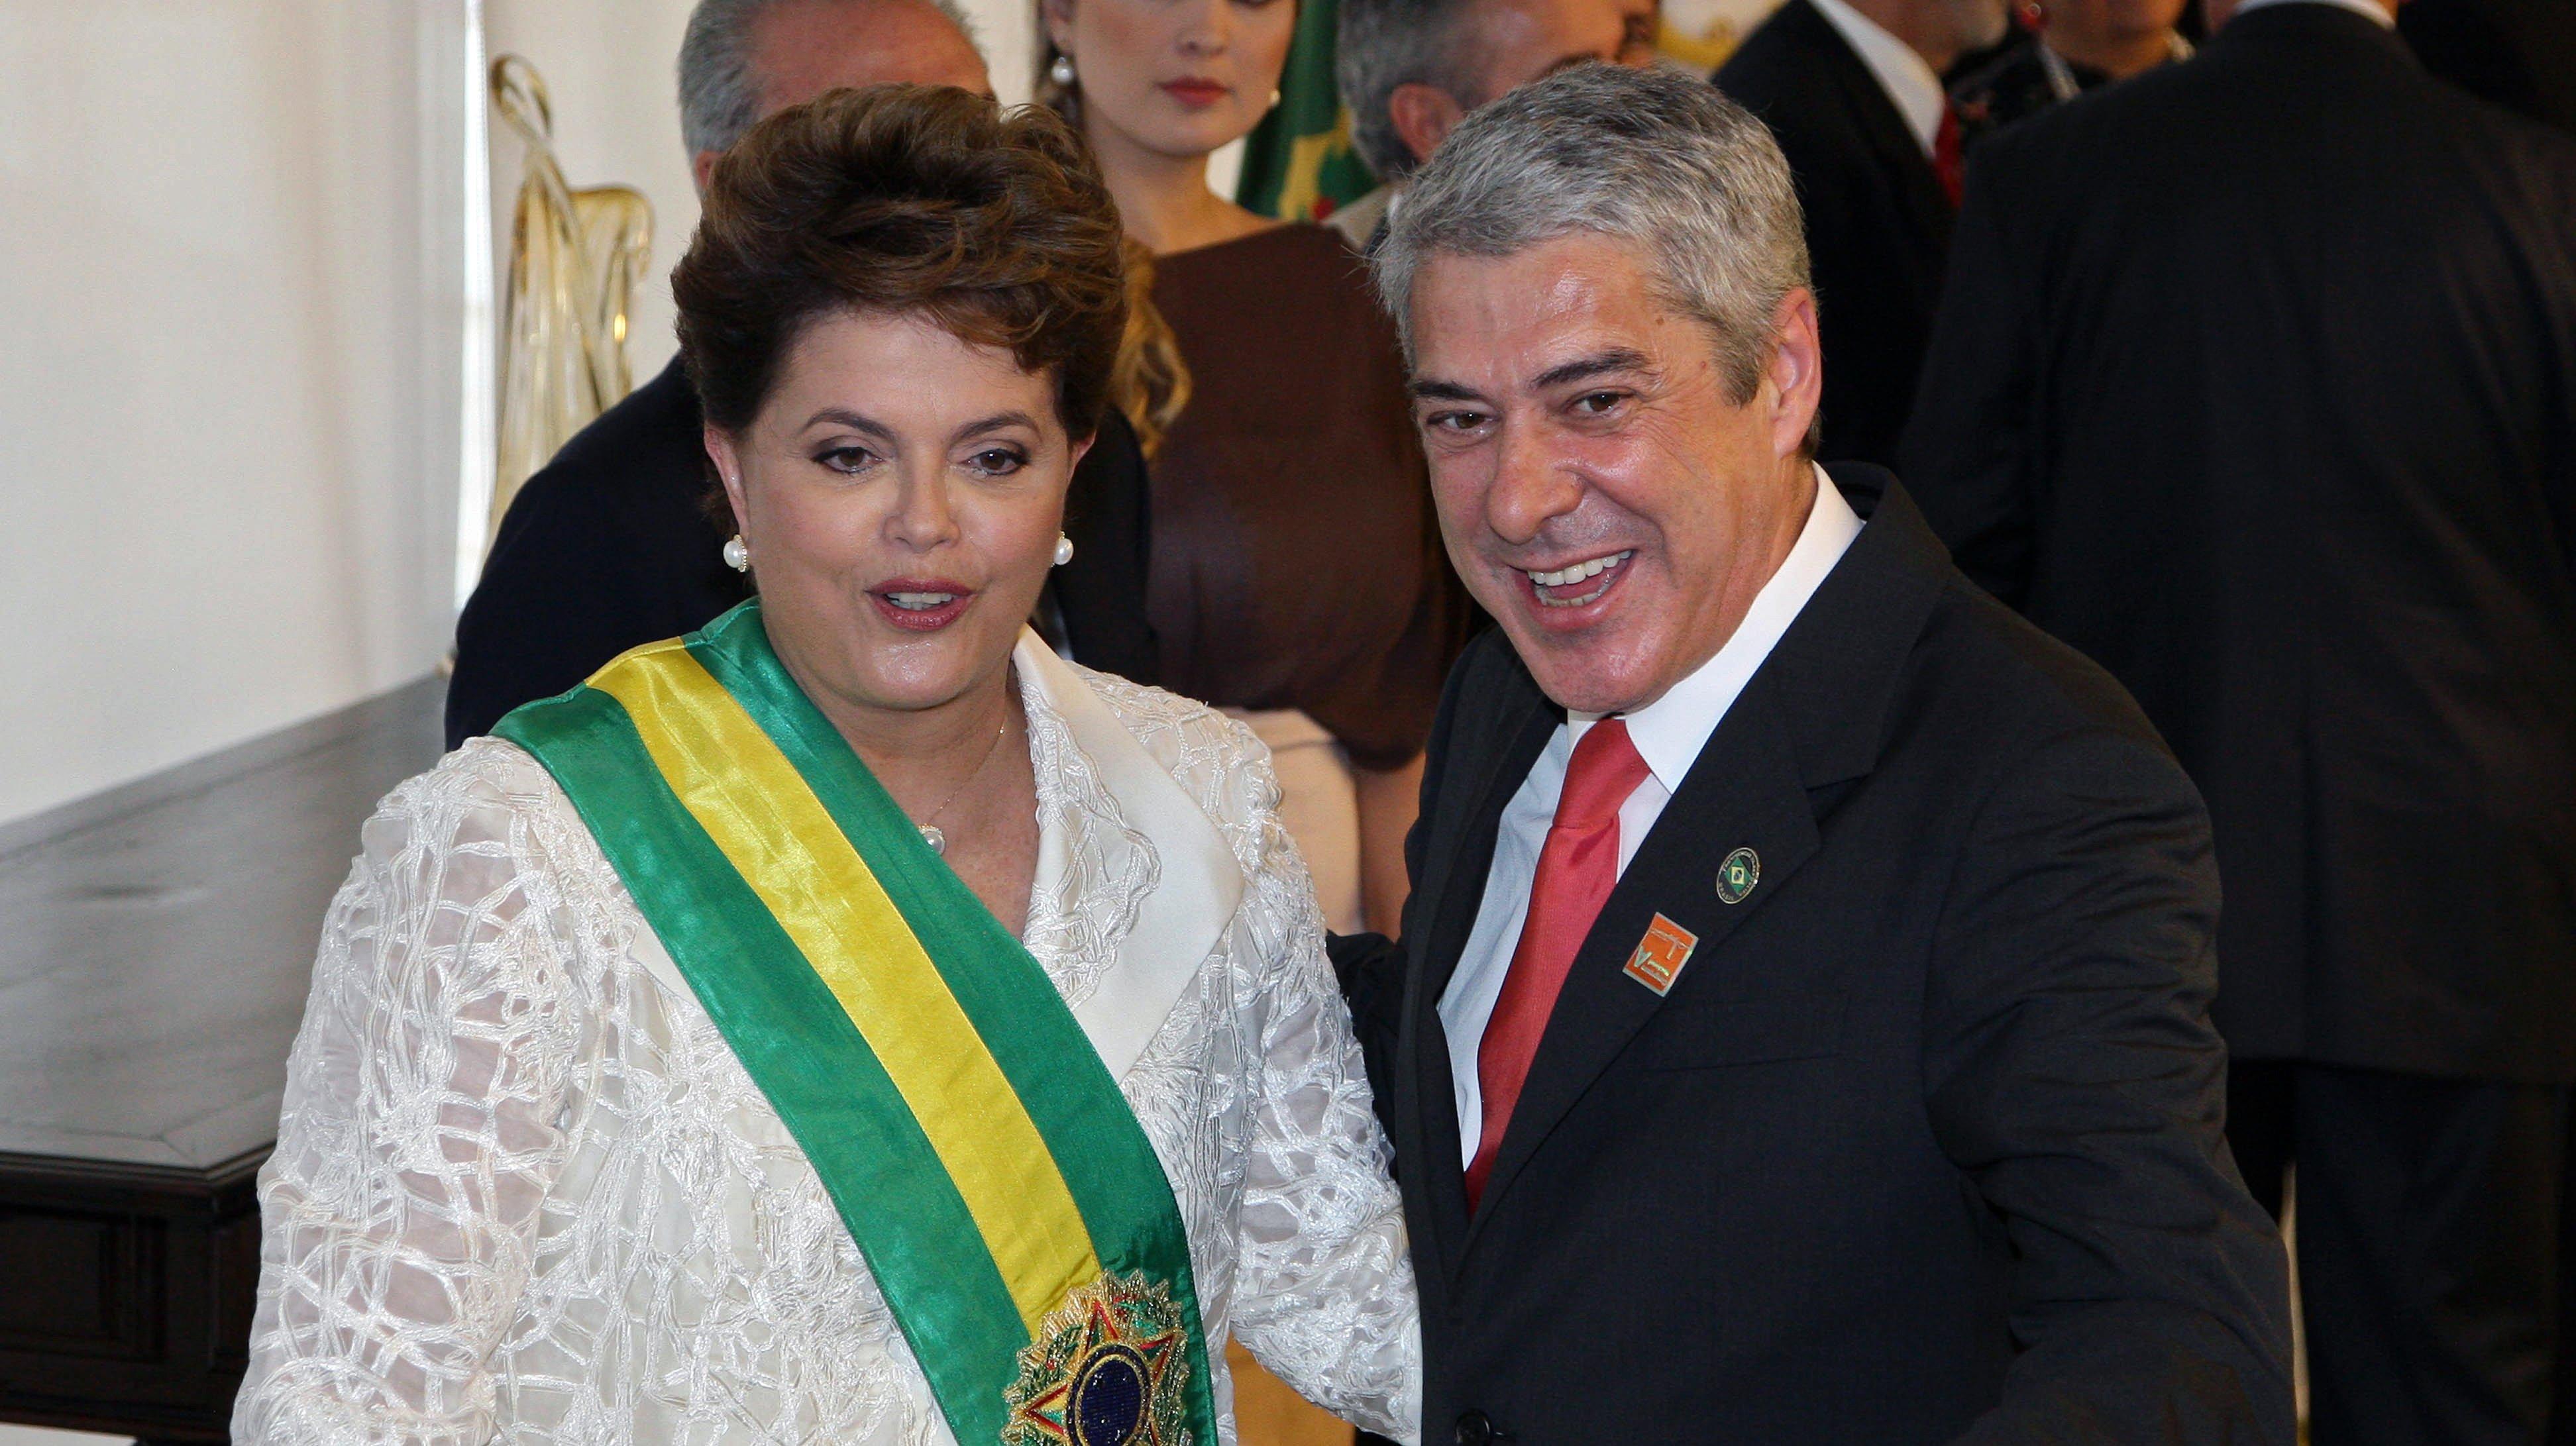 Newly sworn in Brazilian President Dilma